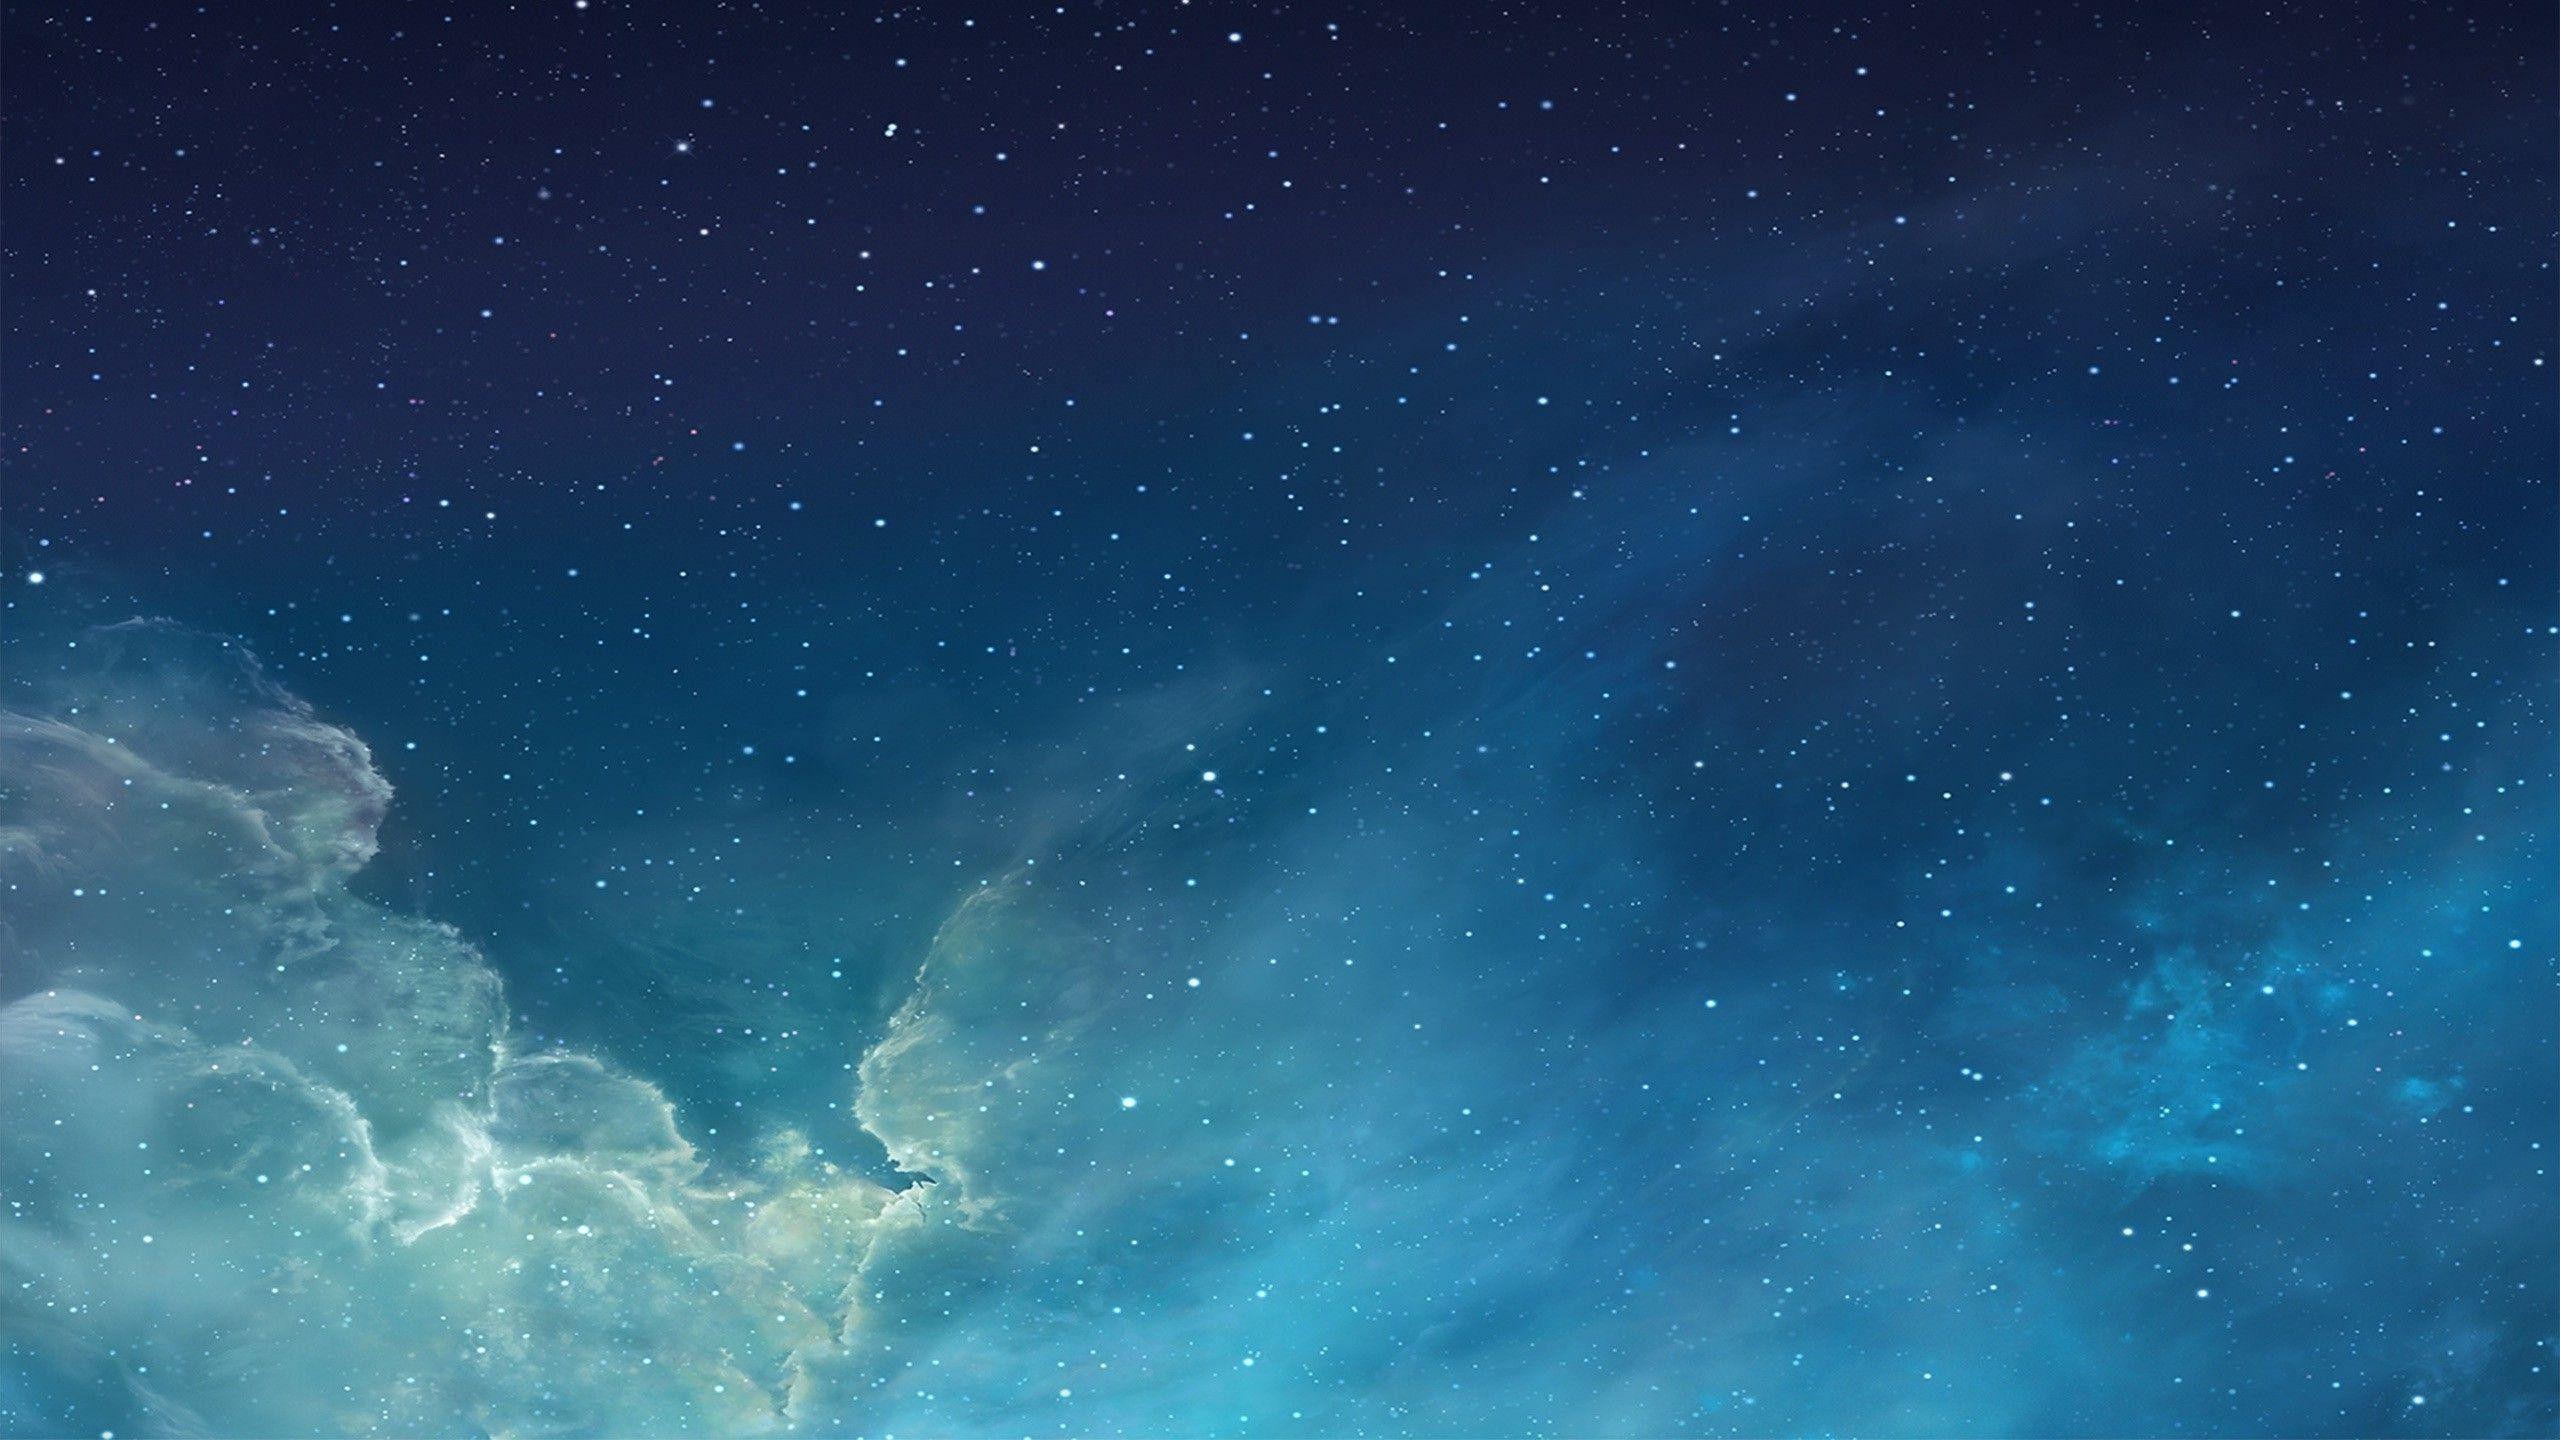 Res 2560x1440 Space Stars Wallpaper Wallpaper Space Background Hd Wallpaper Nebula Wallpaper